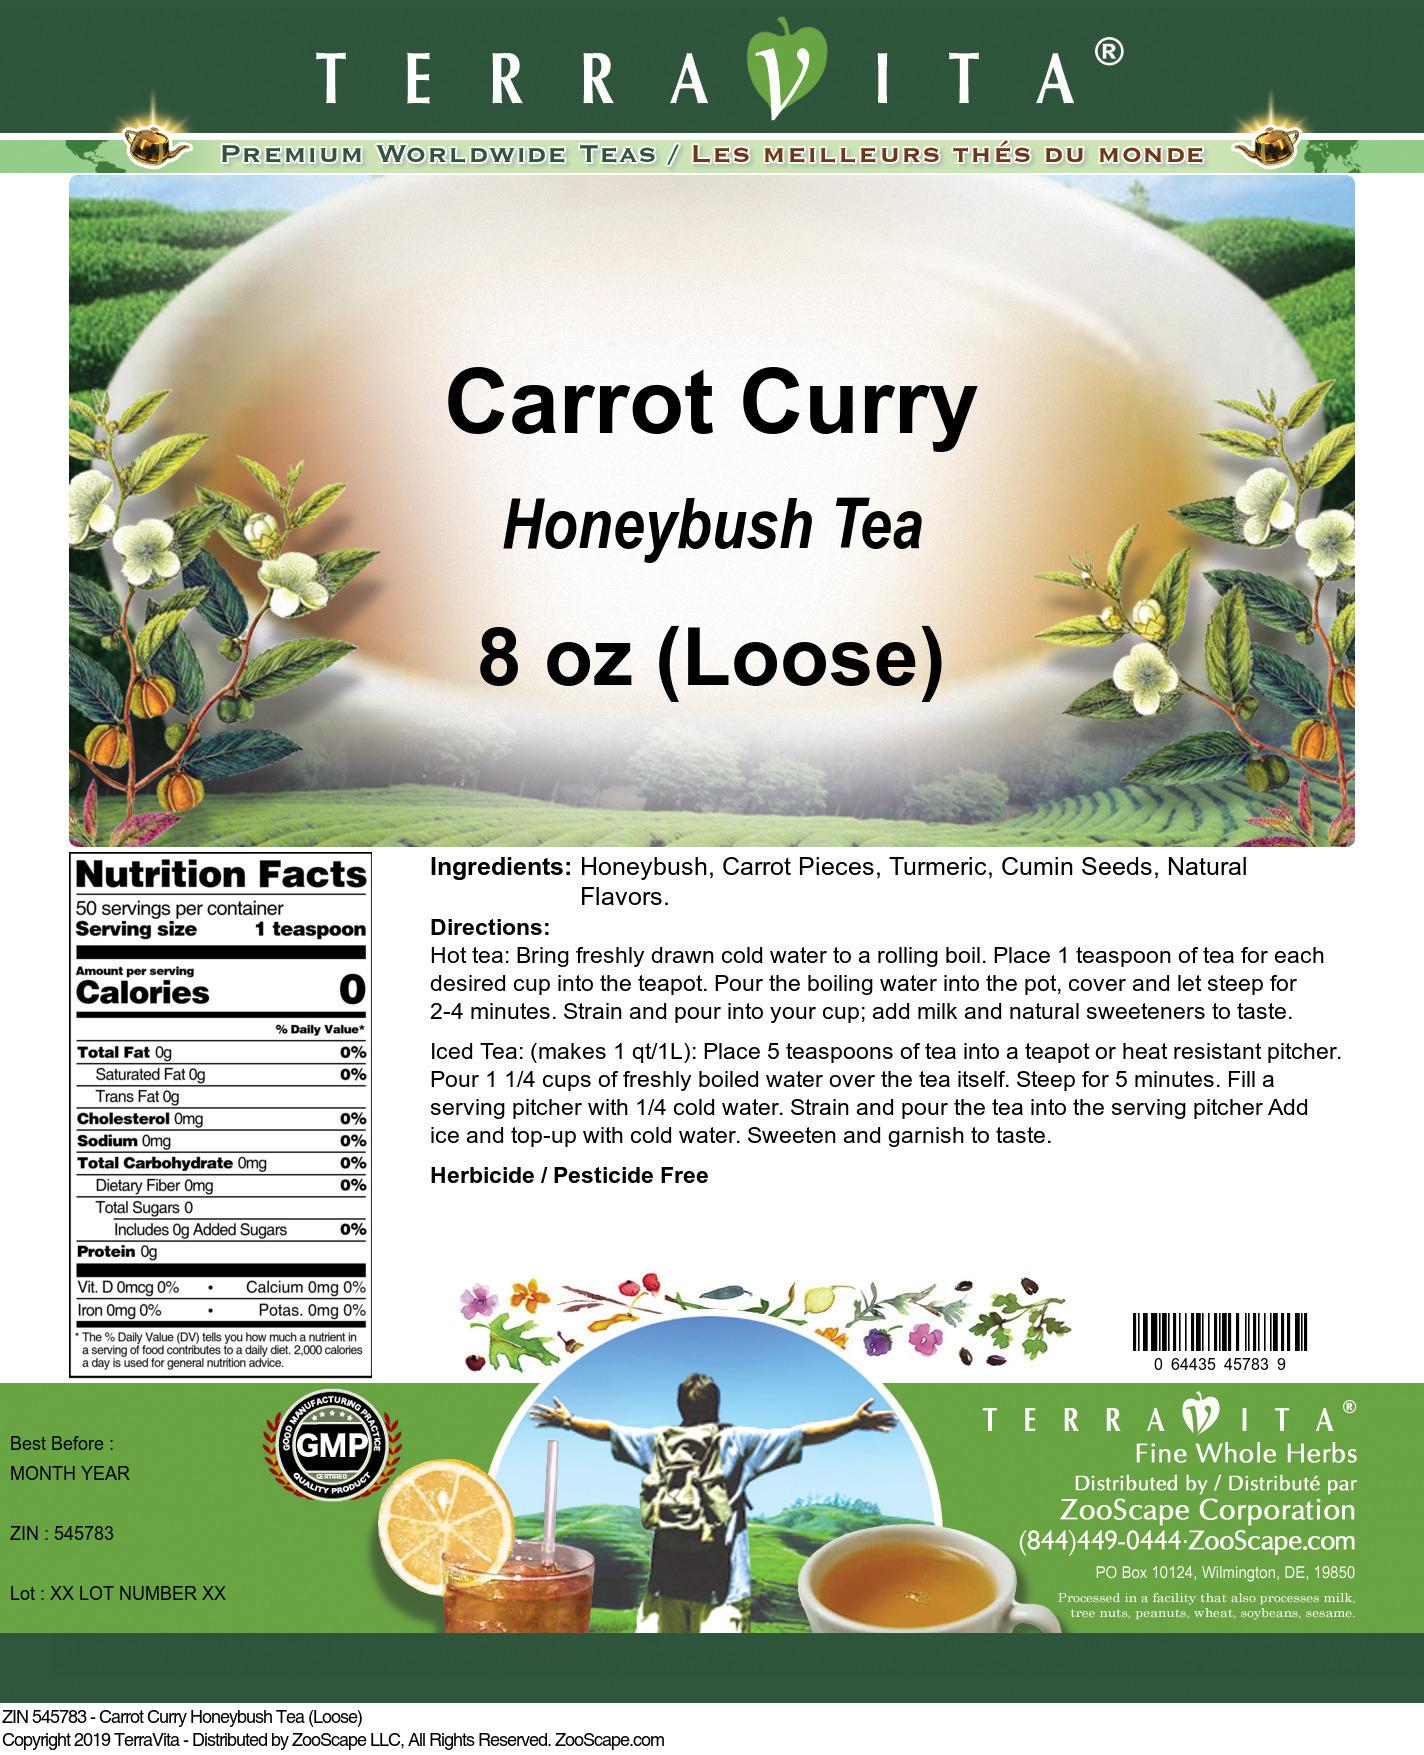 Carrot Curry Honeybush Tea (Loose)